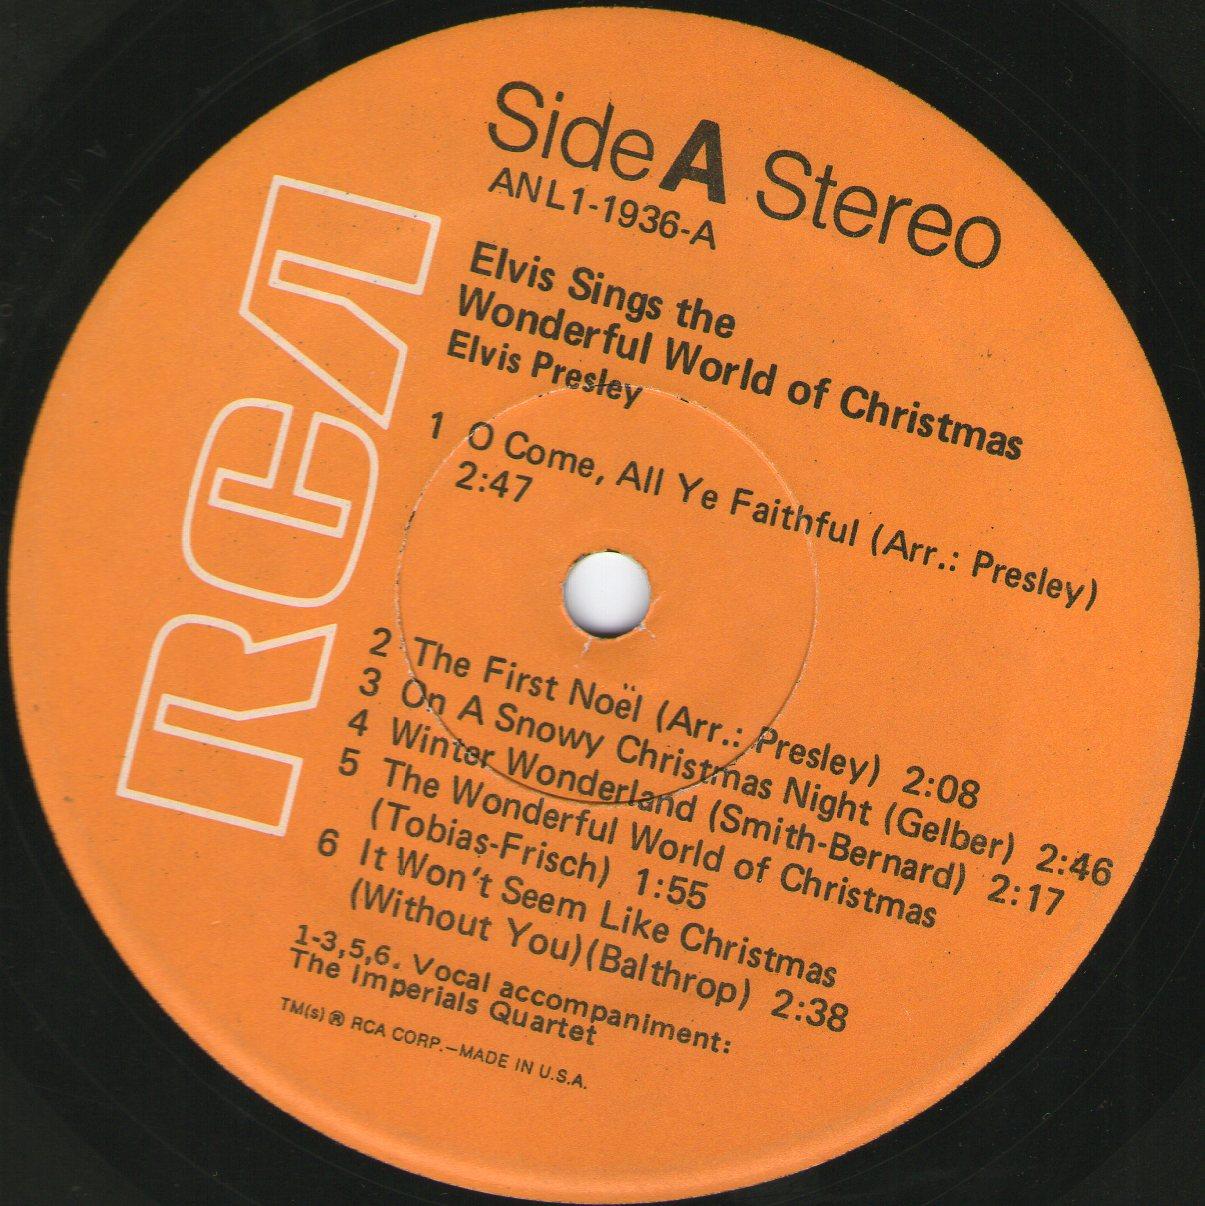 ELVIS SINGS THE WONDERFUL WORLD OF CHRISTMAS Img43901sz1